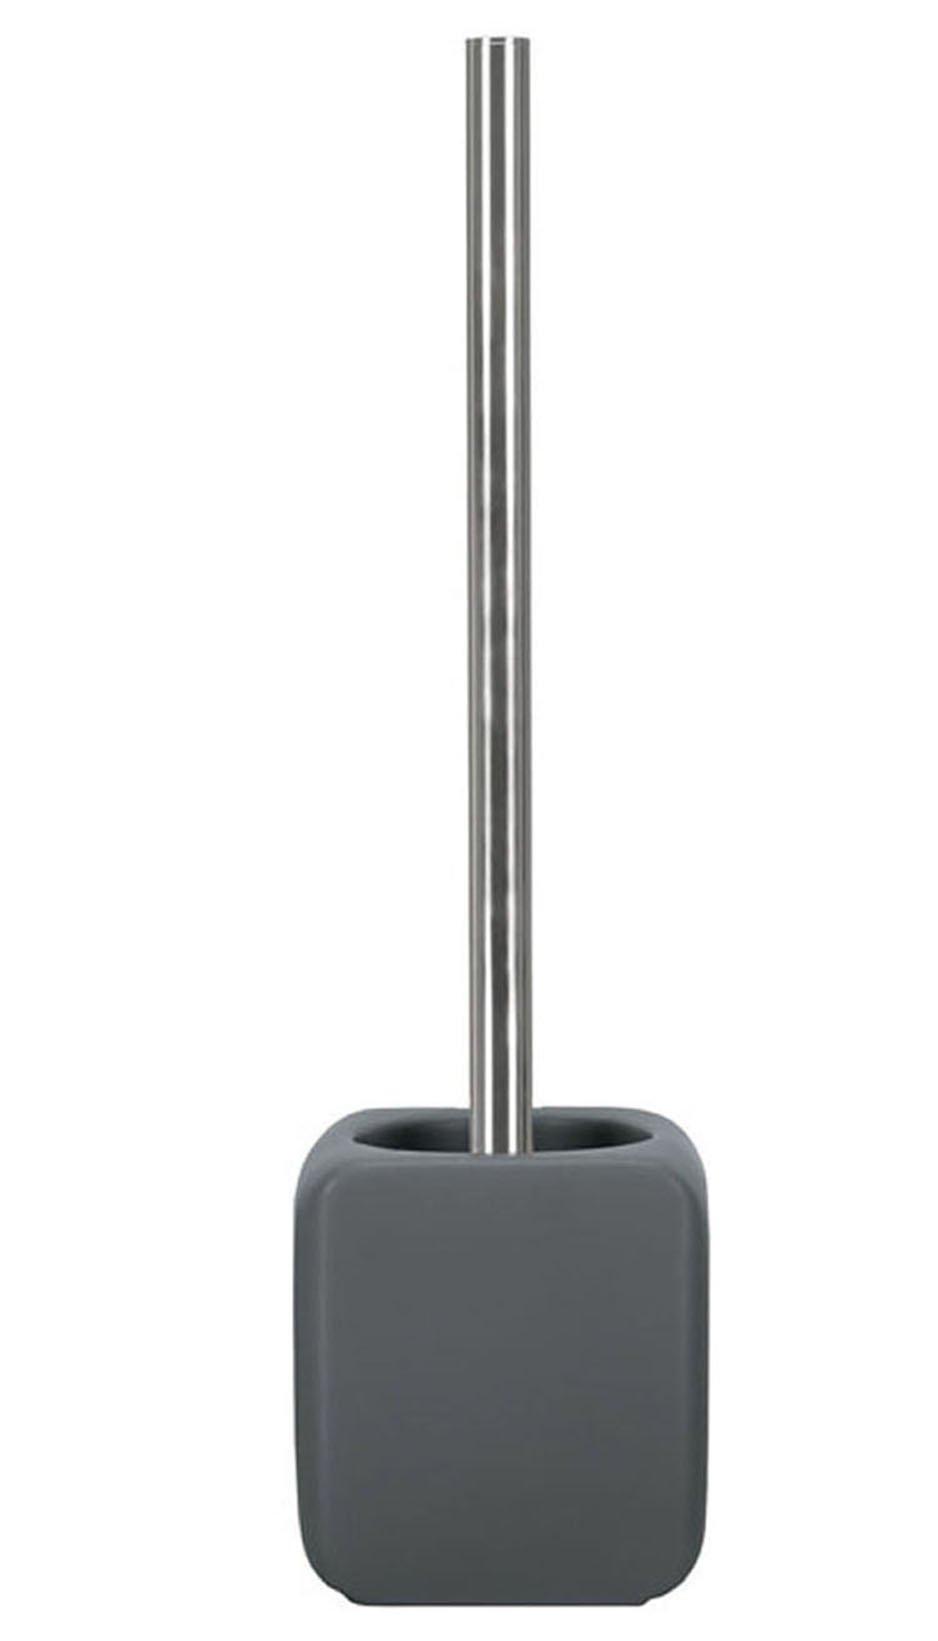 WC-Bürstenhalter Cubic Anthrazit B:10,8cm